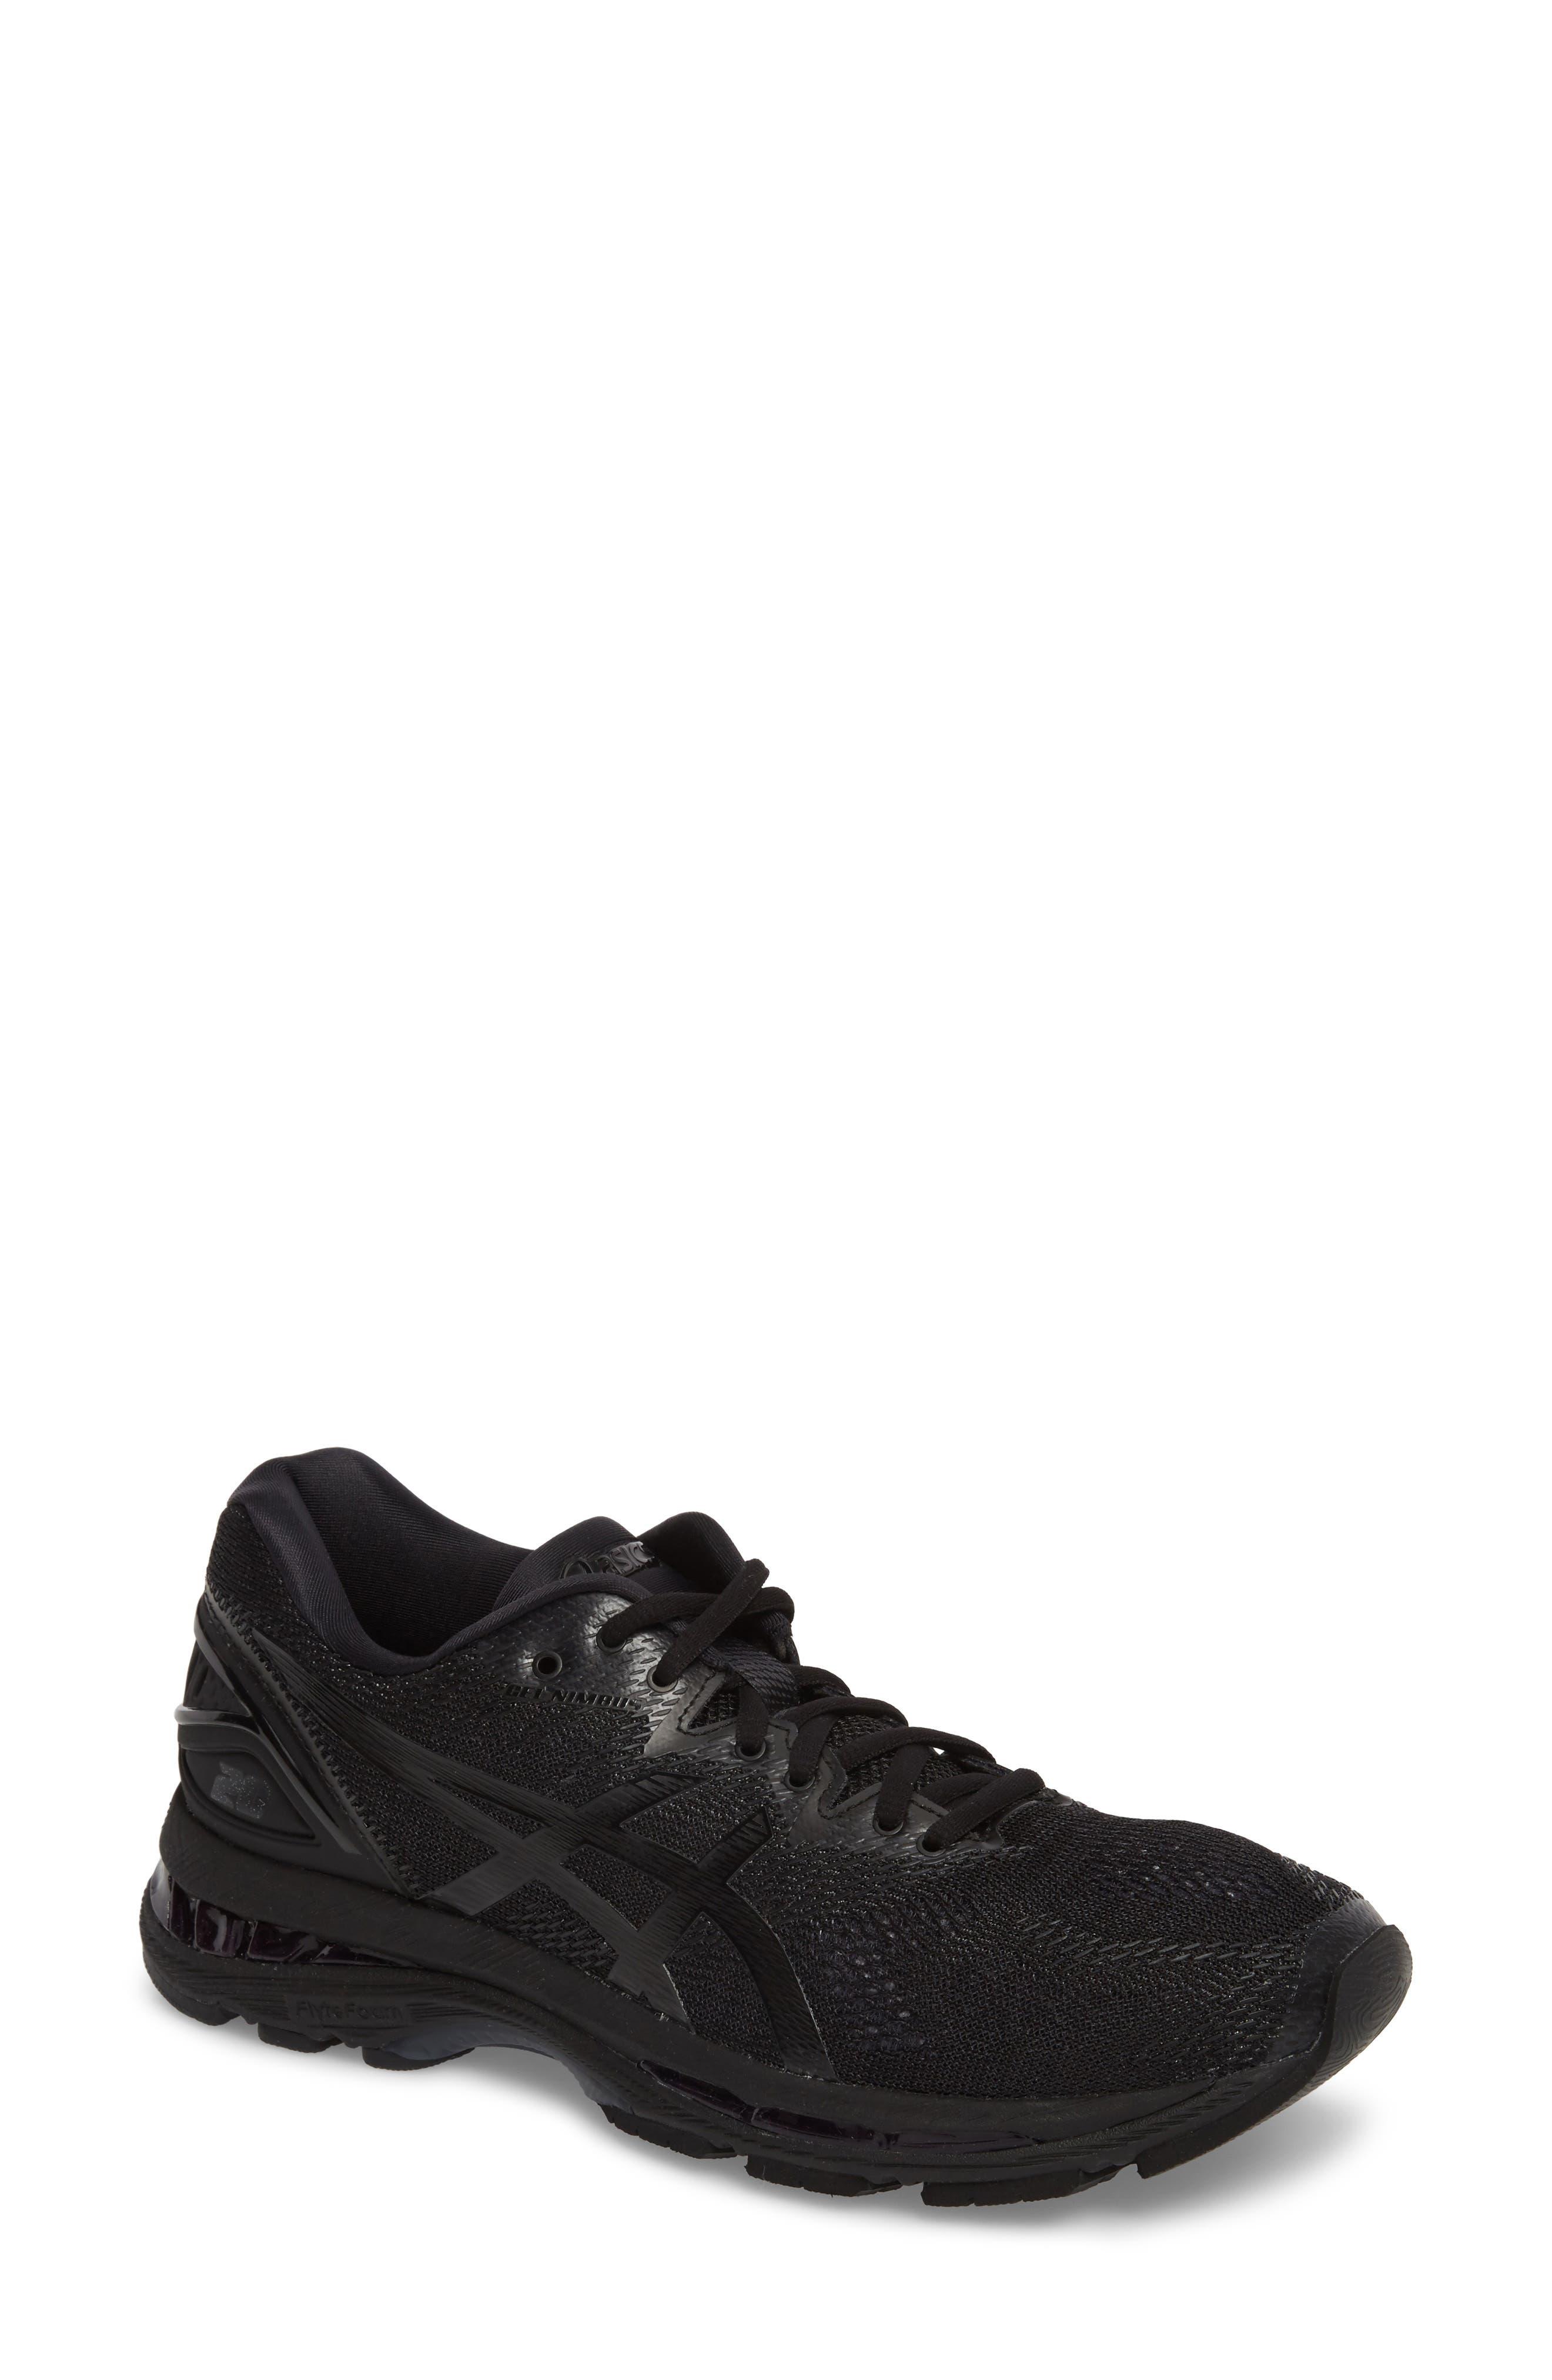 Main Image - ASICS® GEL®-Nimbus 20 Running Shoe (Women)